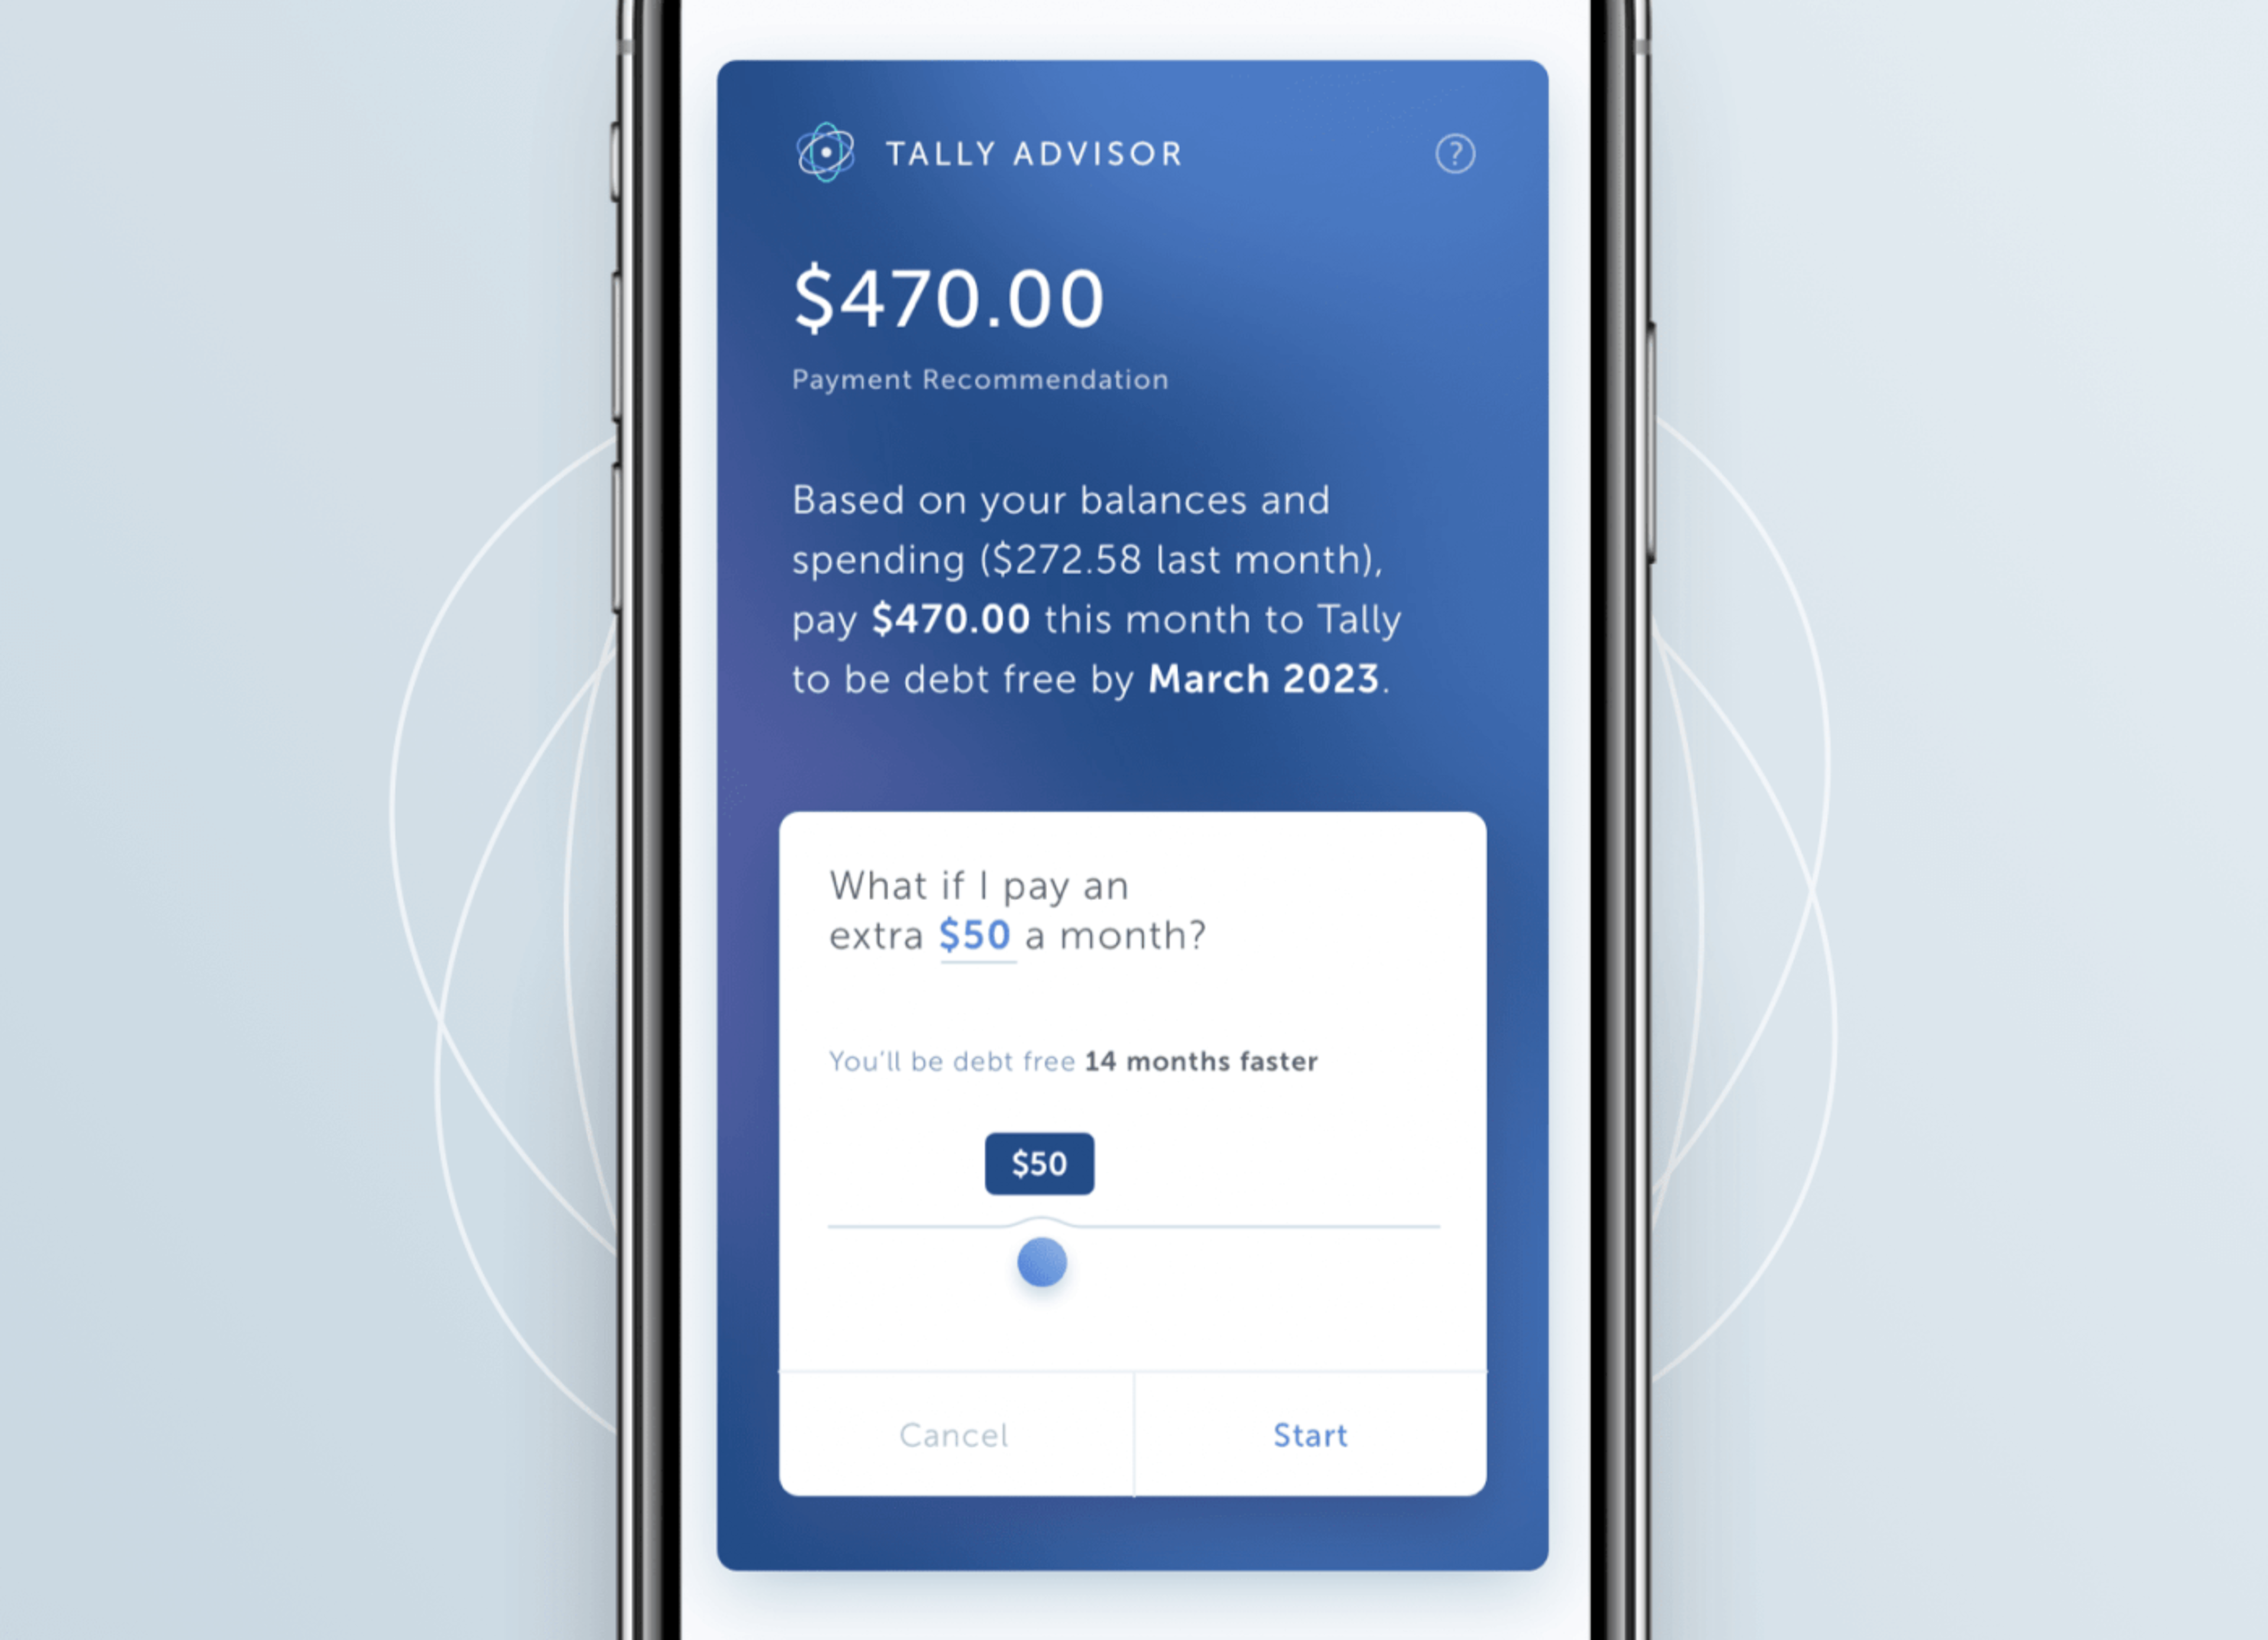 Tally robo advisor, debt manager app